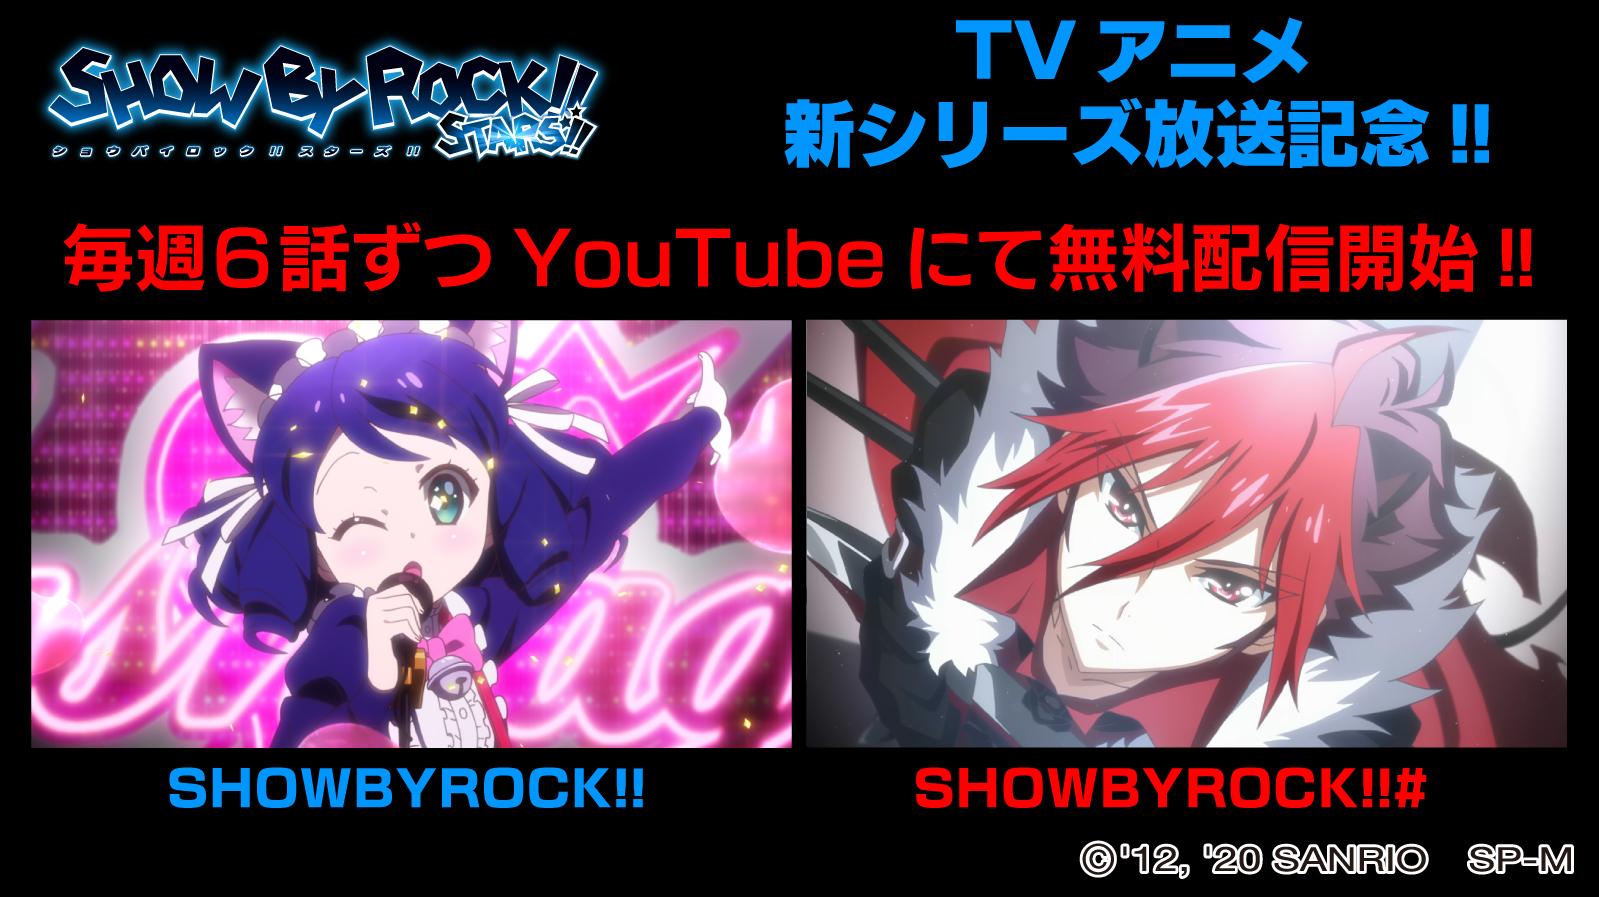 TVアニメ「SHOW BY ROCK!!」第1期&2期が期間限定で全話無料配信決定!冬の新作放送の前におさらいしよう